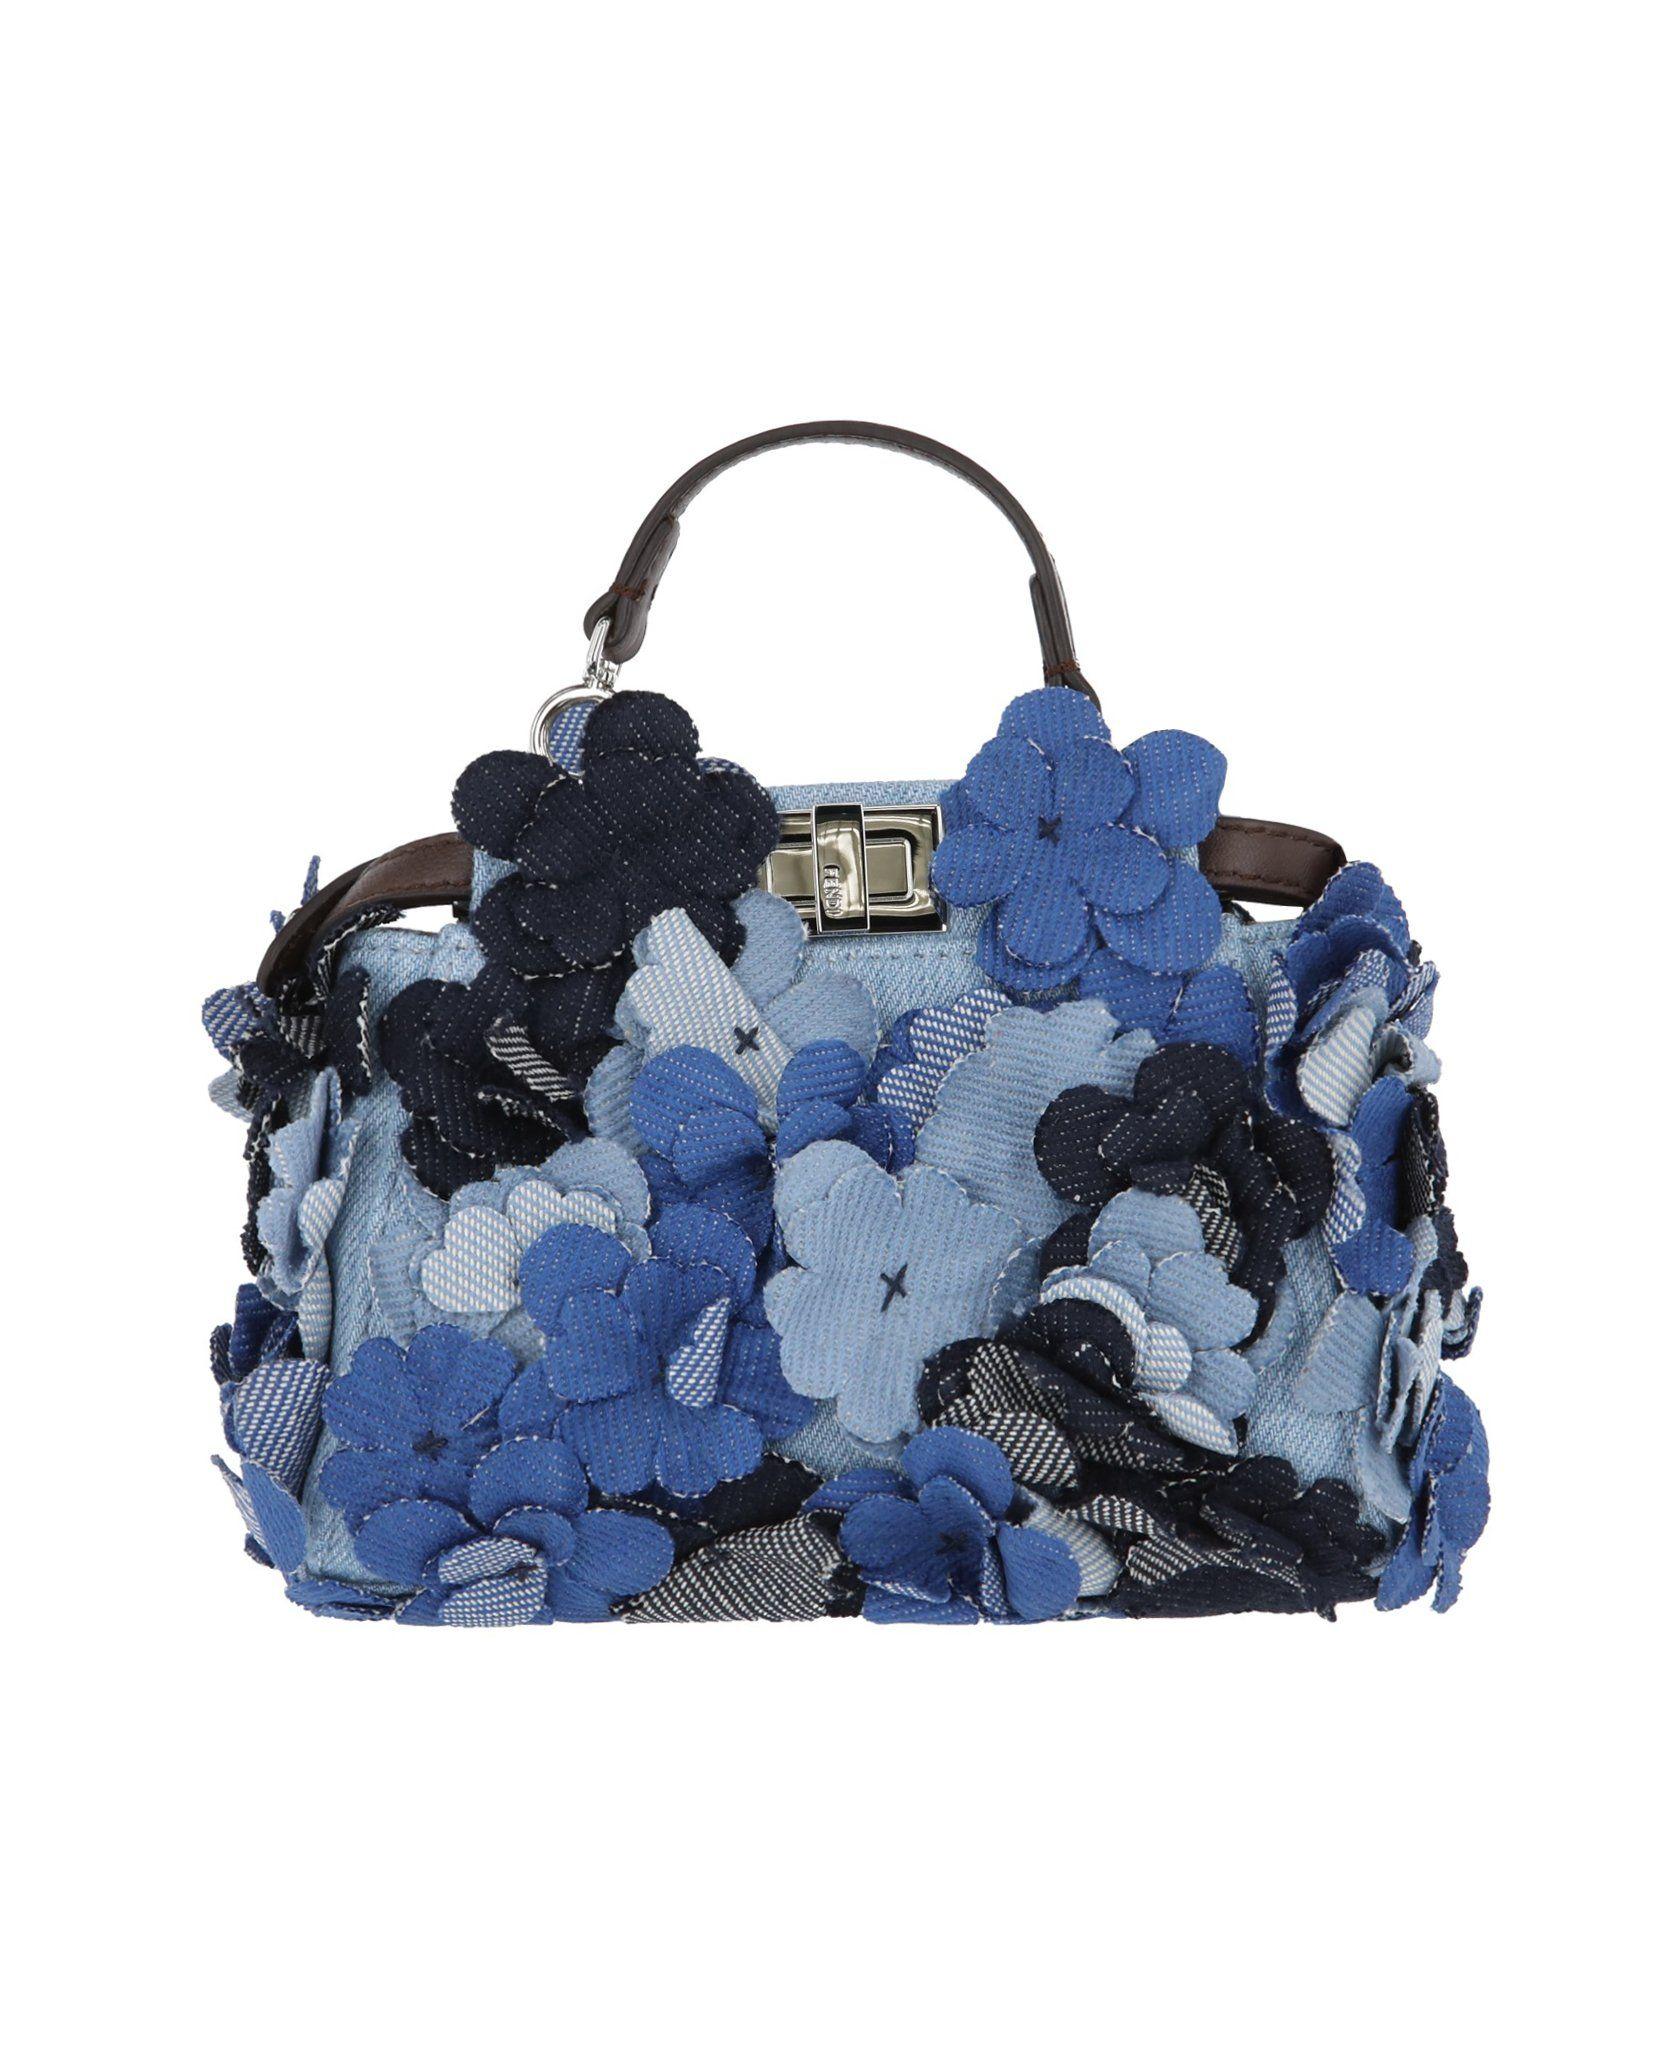 Fendi Micro Peekaboo Handbag  934eb96963c76